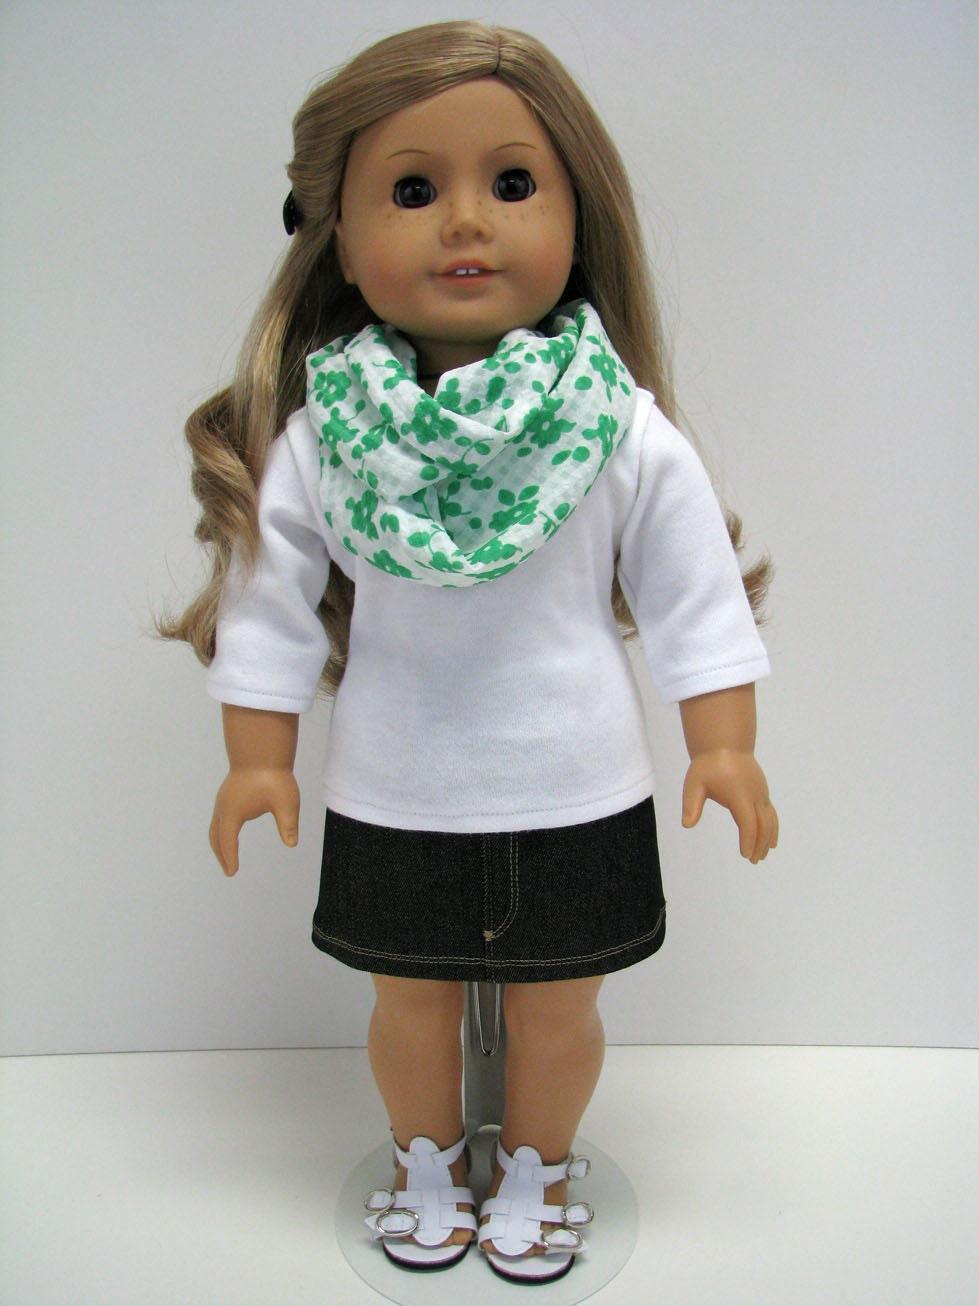 girl doll clothes 18 inch doll clothes 18 inch doll scarf